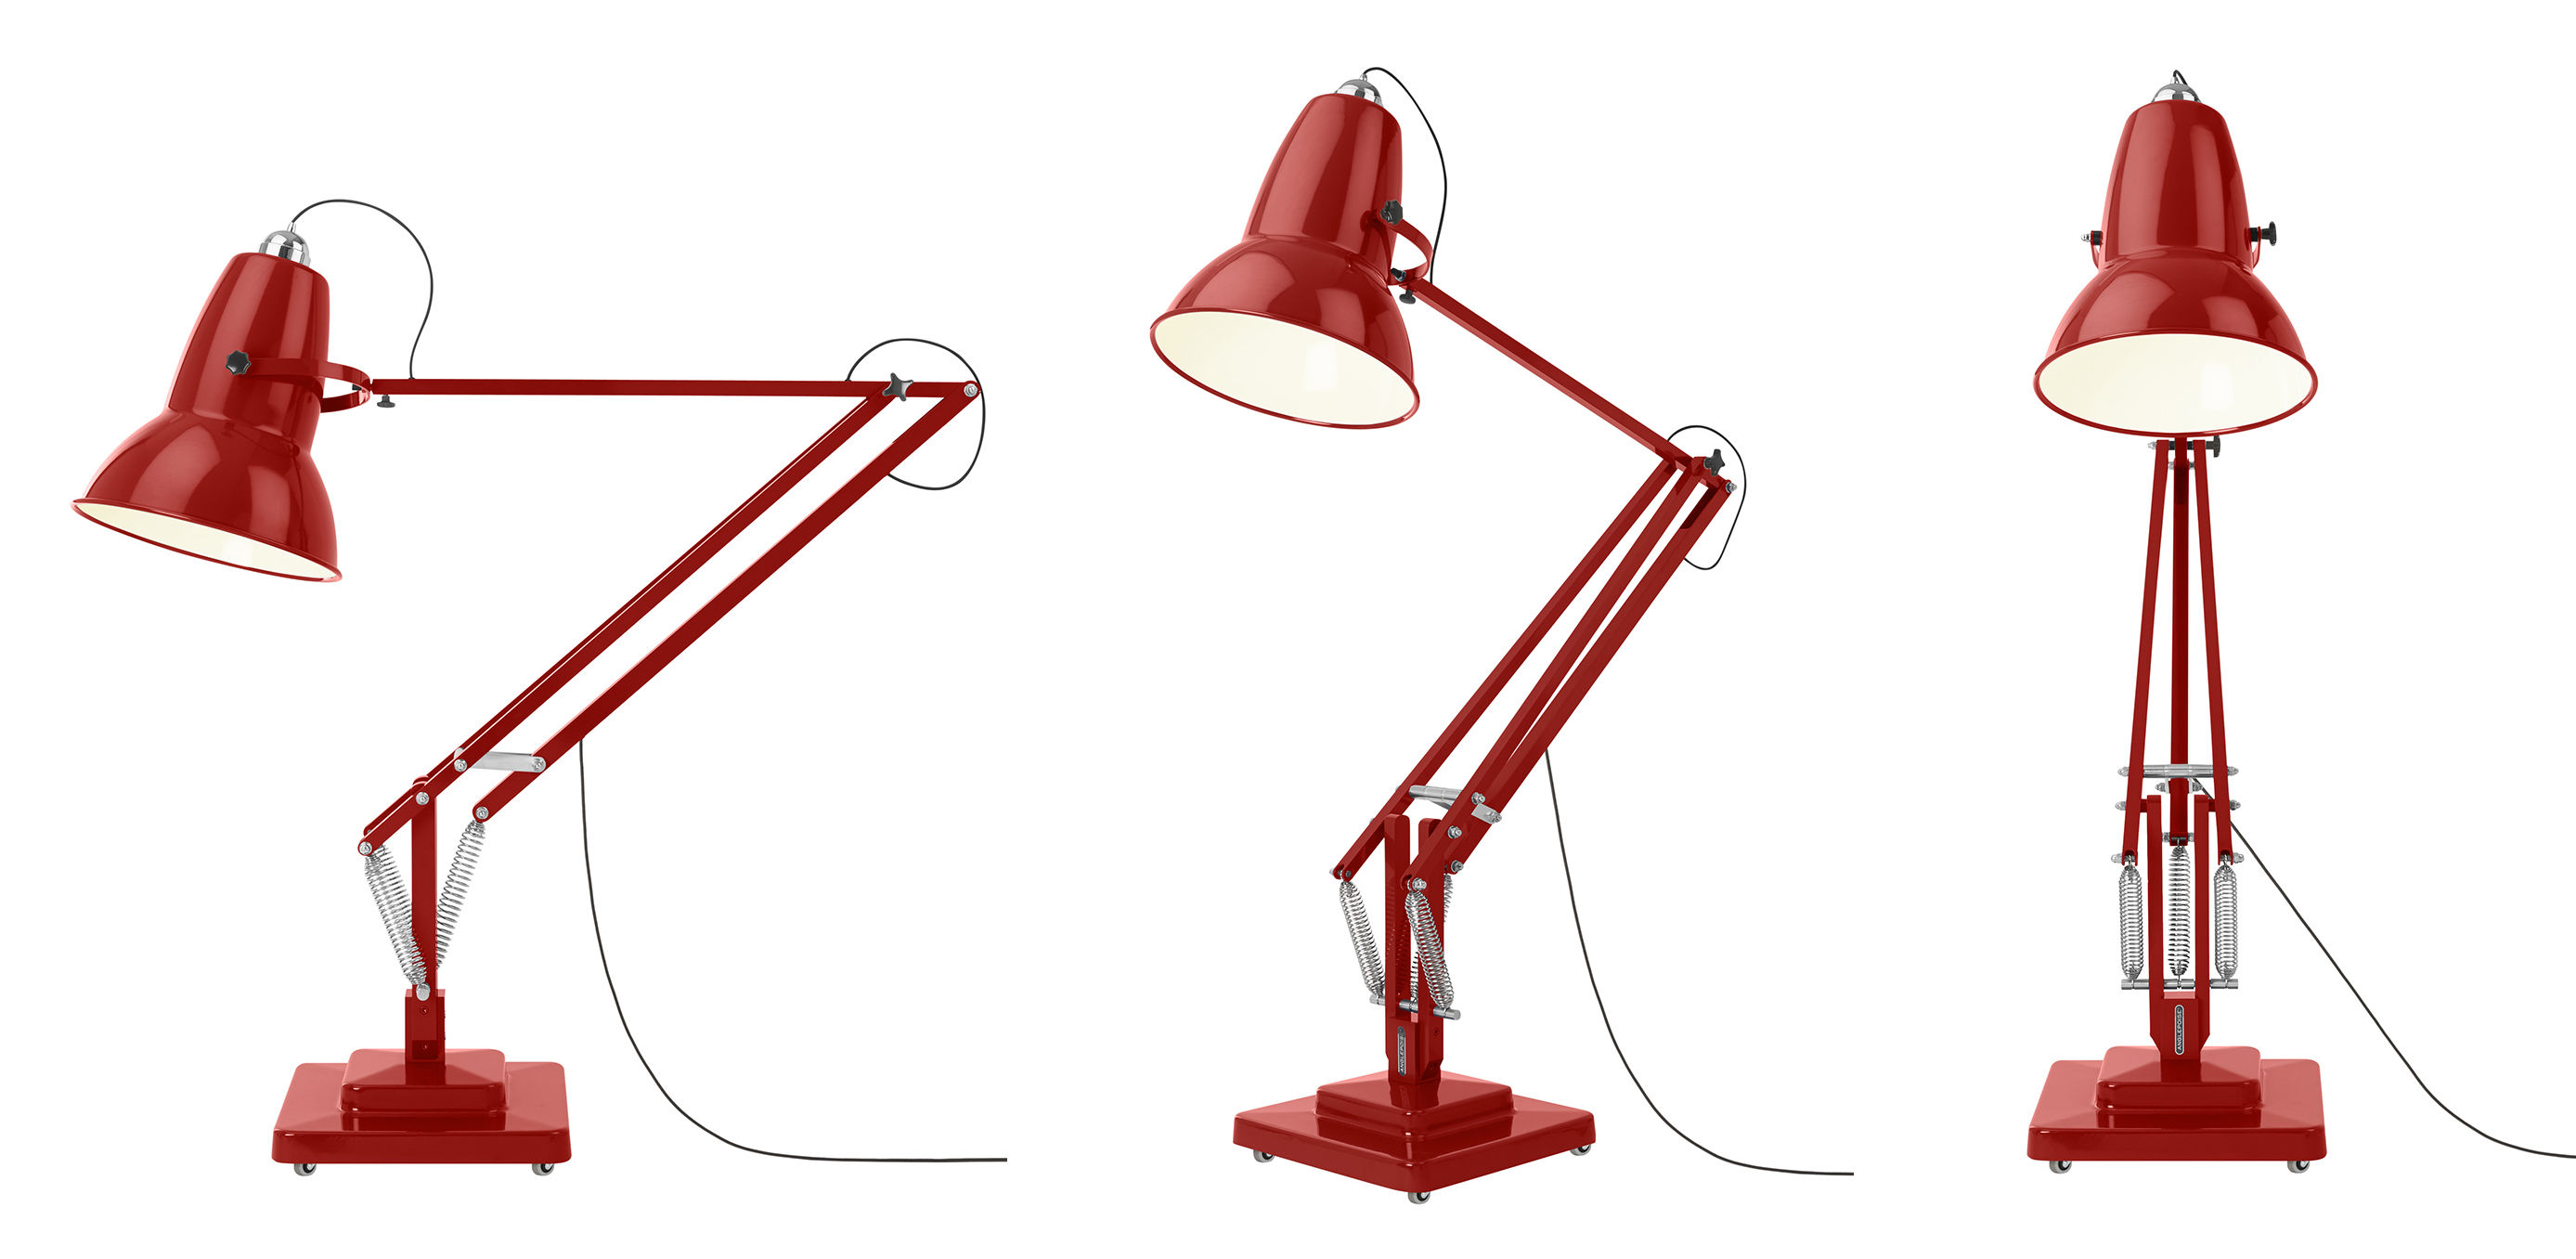 Lampadaire giant 1227 h 270 cm rouge anglepoise - Luminaire industriel la giant collection par anglepoise ...